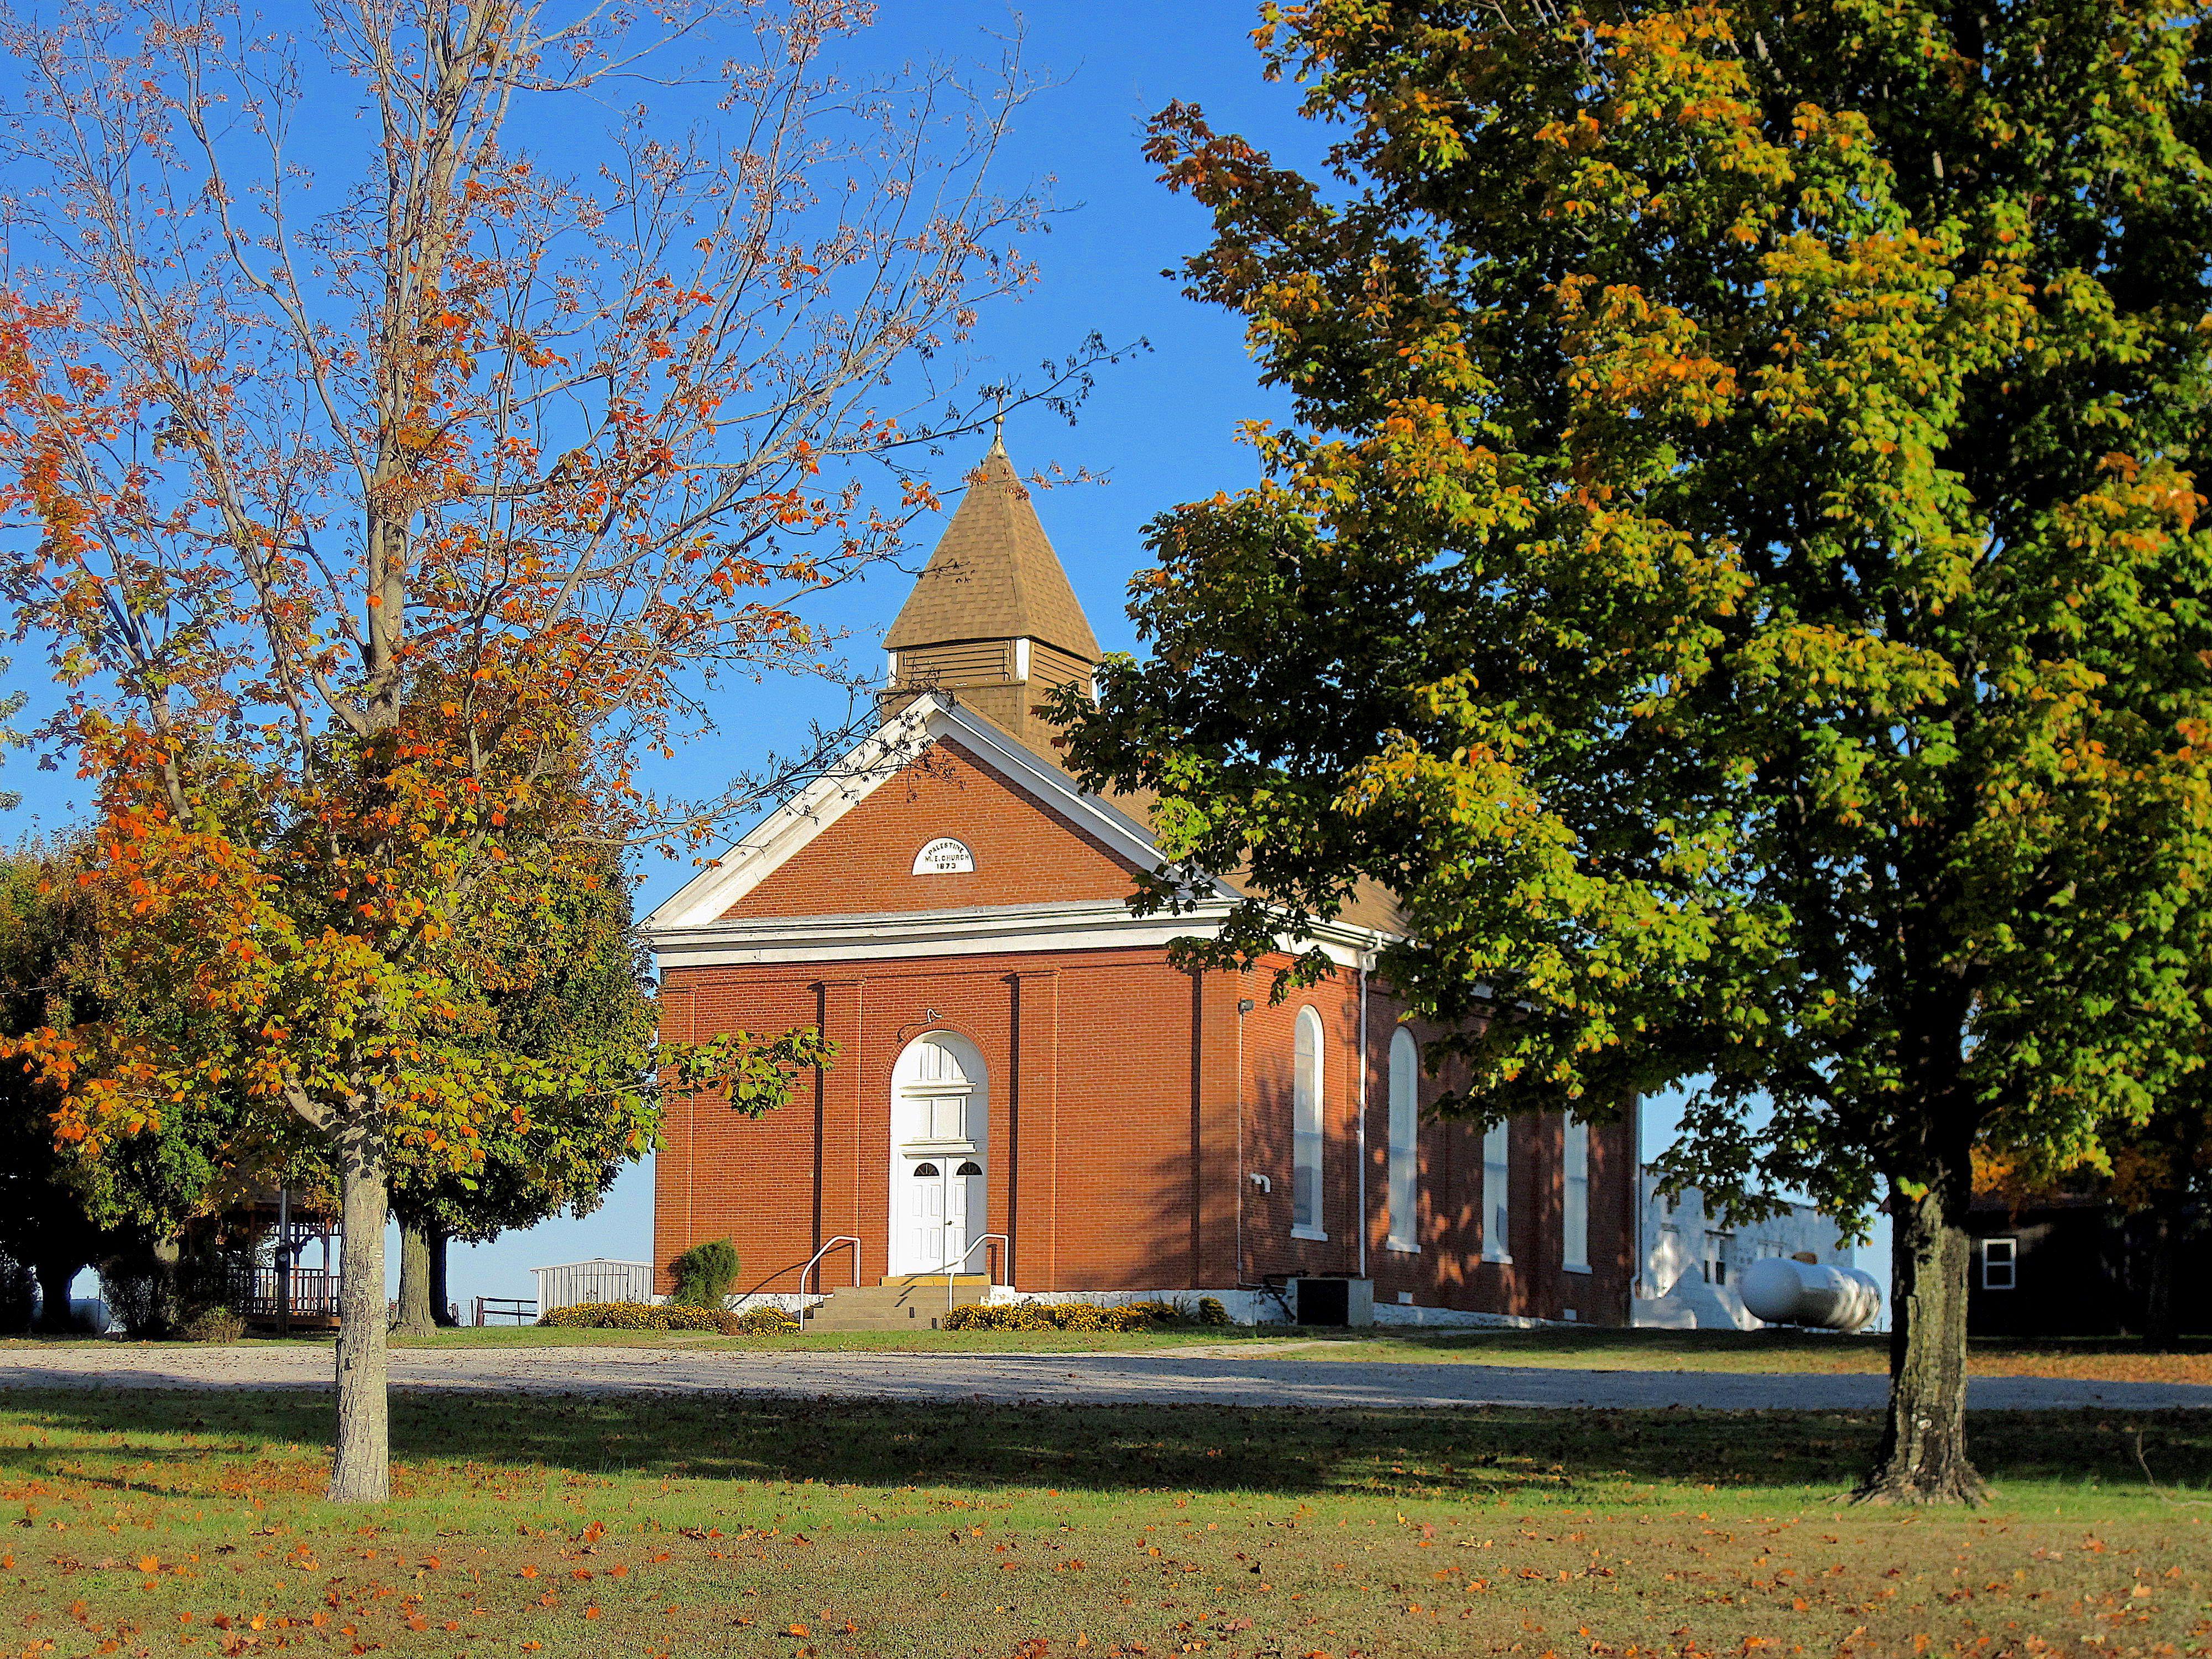 Illinois randolph county baldwin - Find This Pin And More On Autumn In Randolph County Illinois